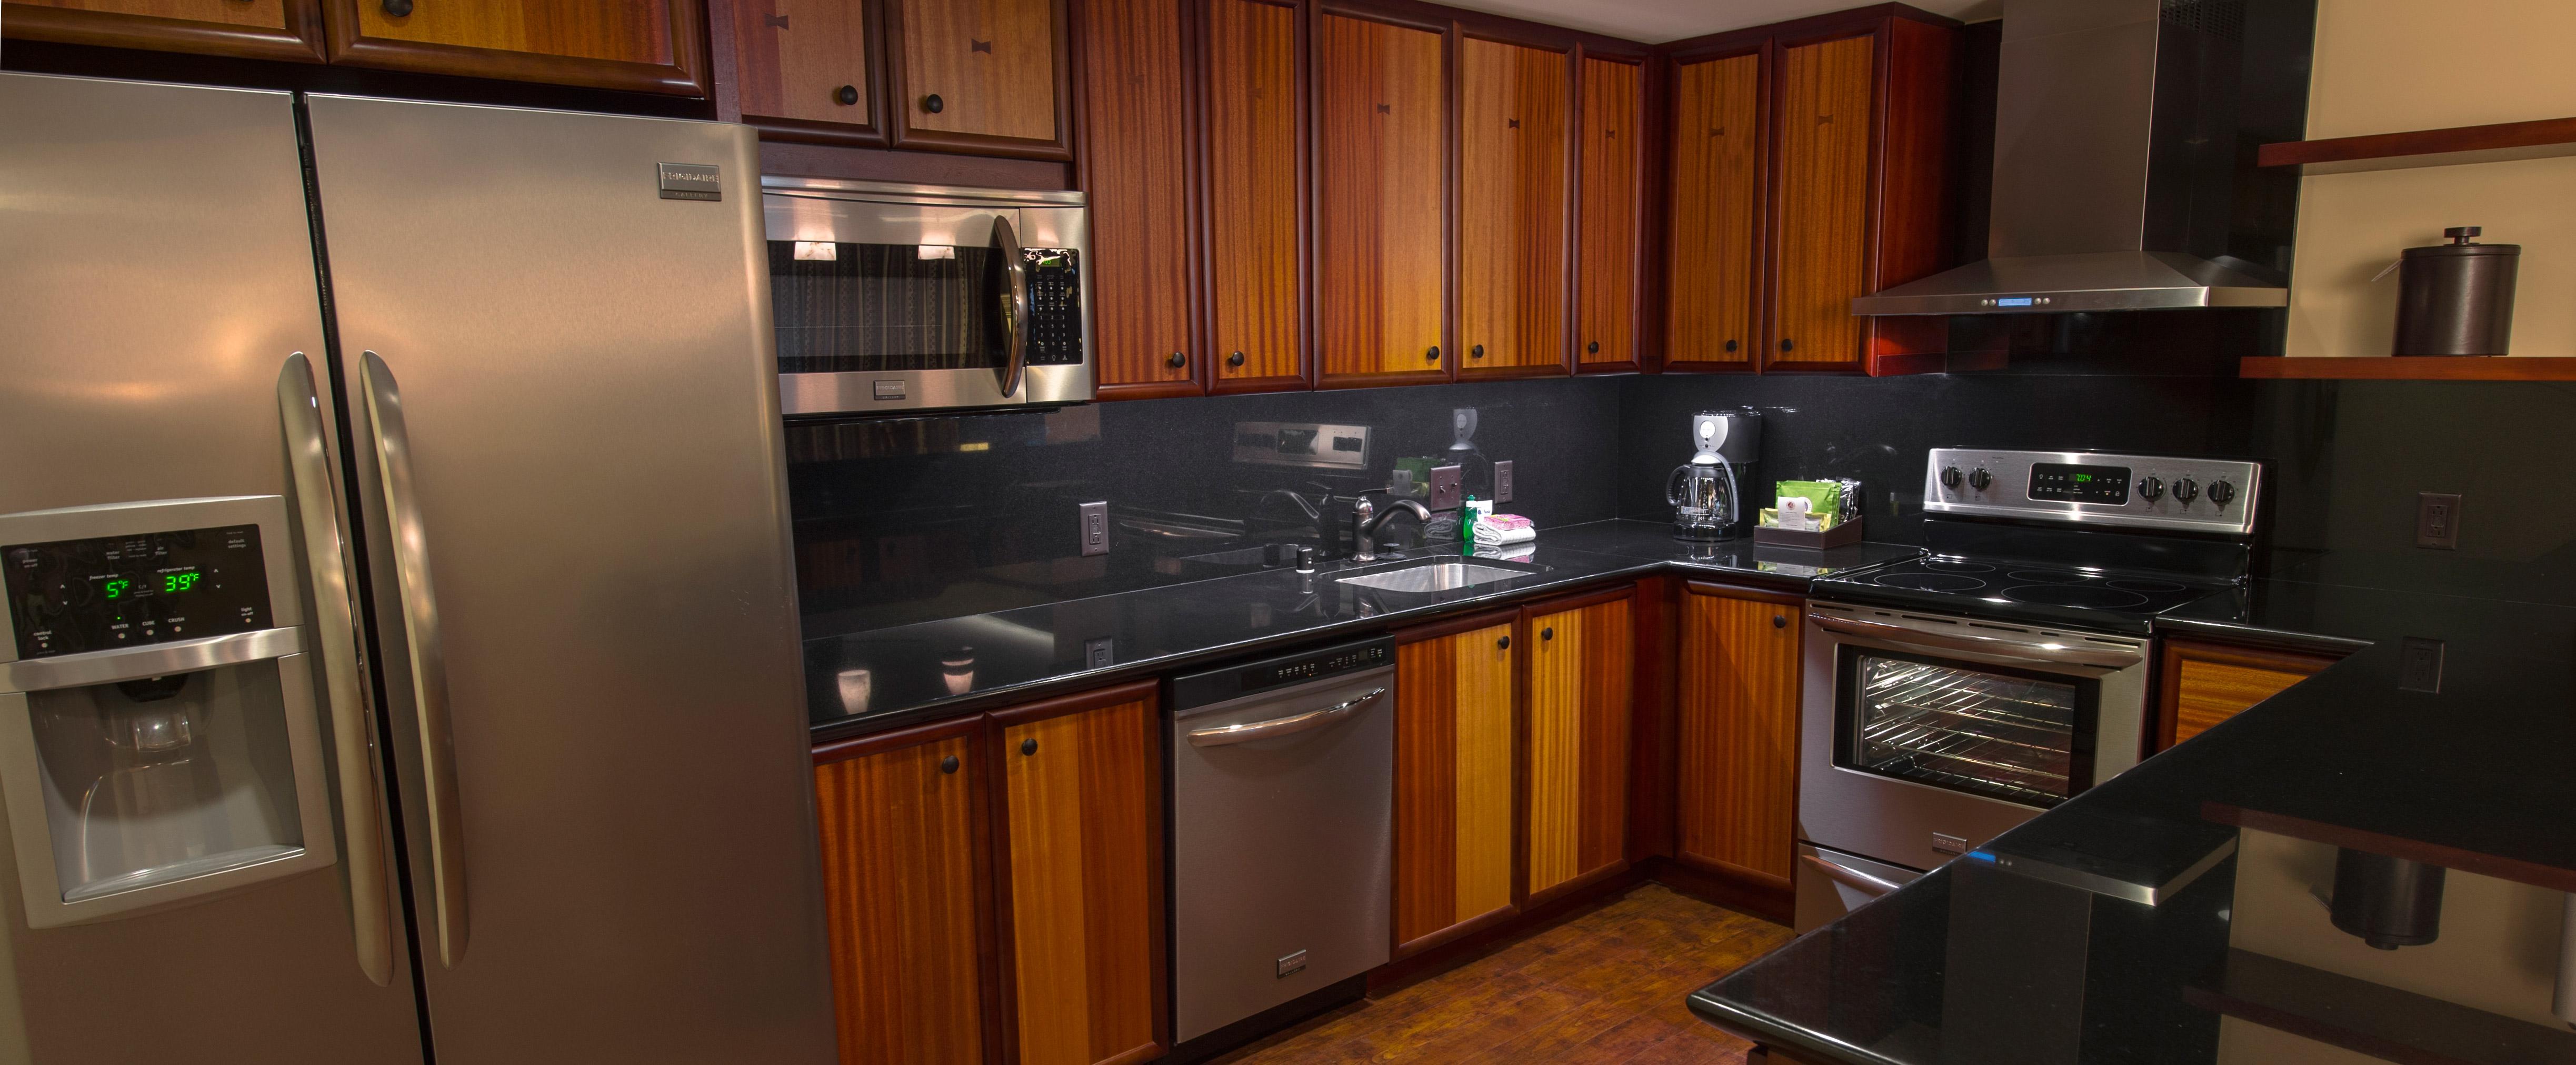 Deluxe Studio: Each studio features a kitchenette.